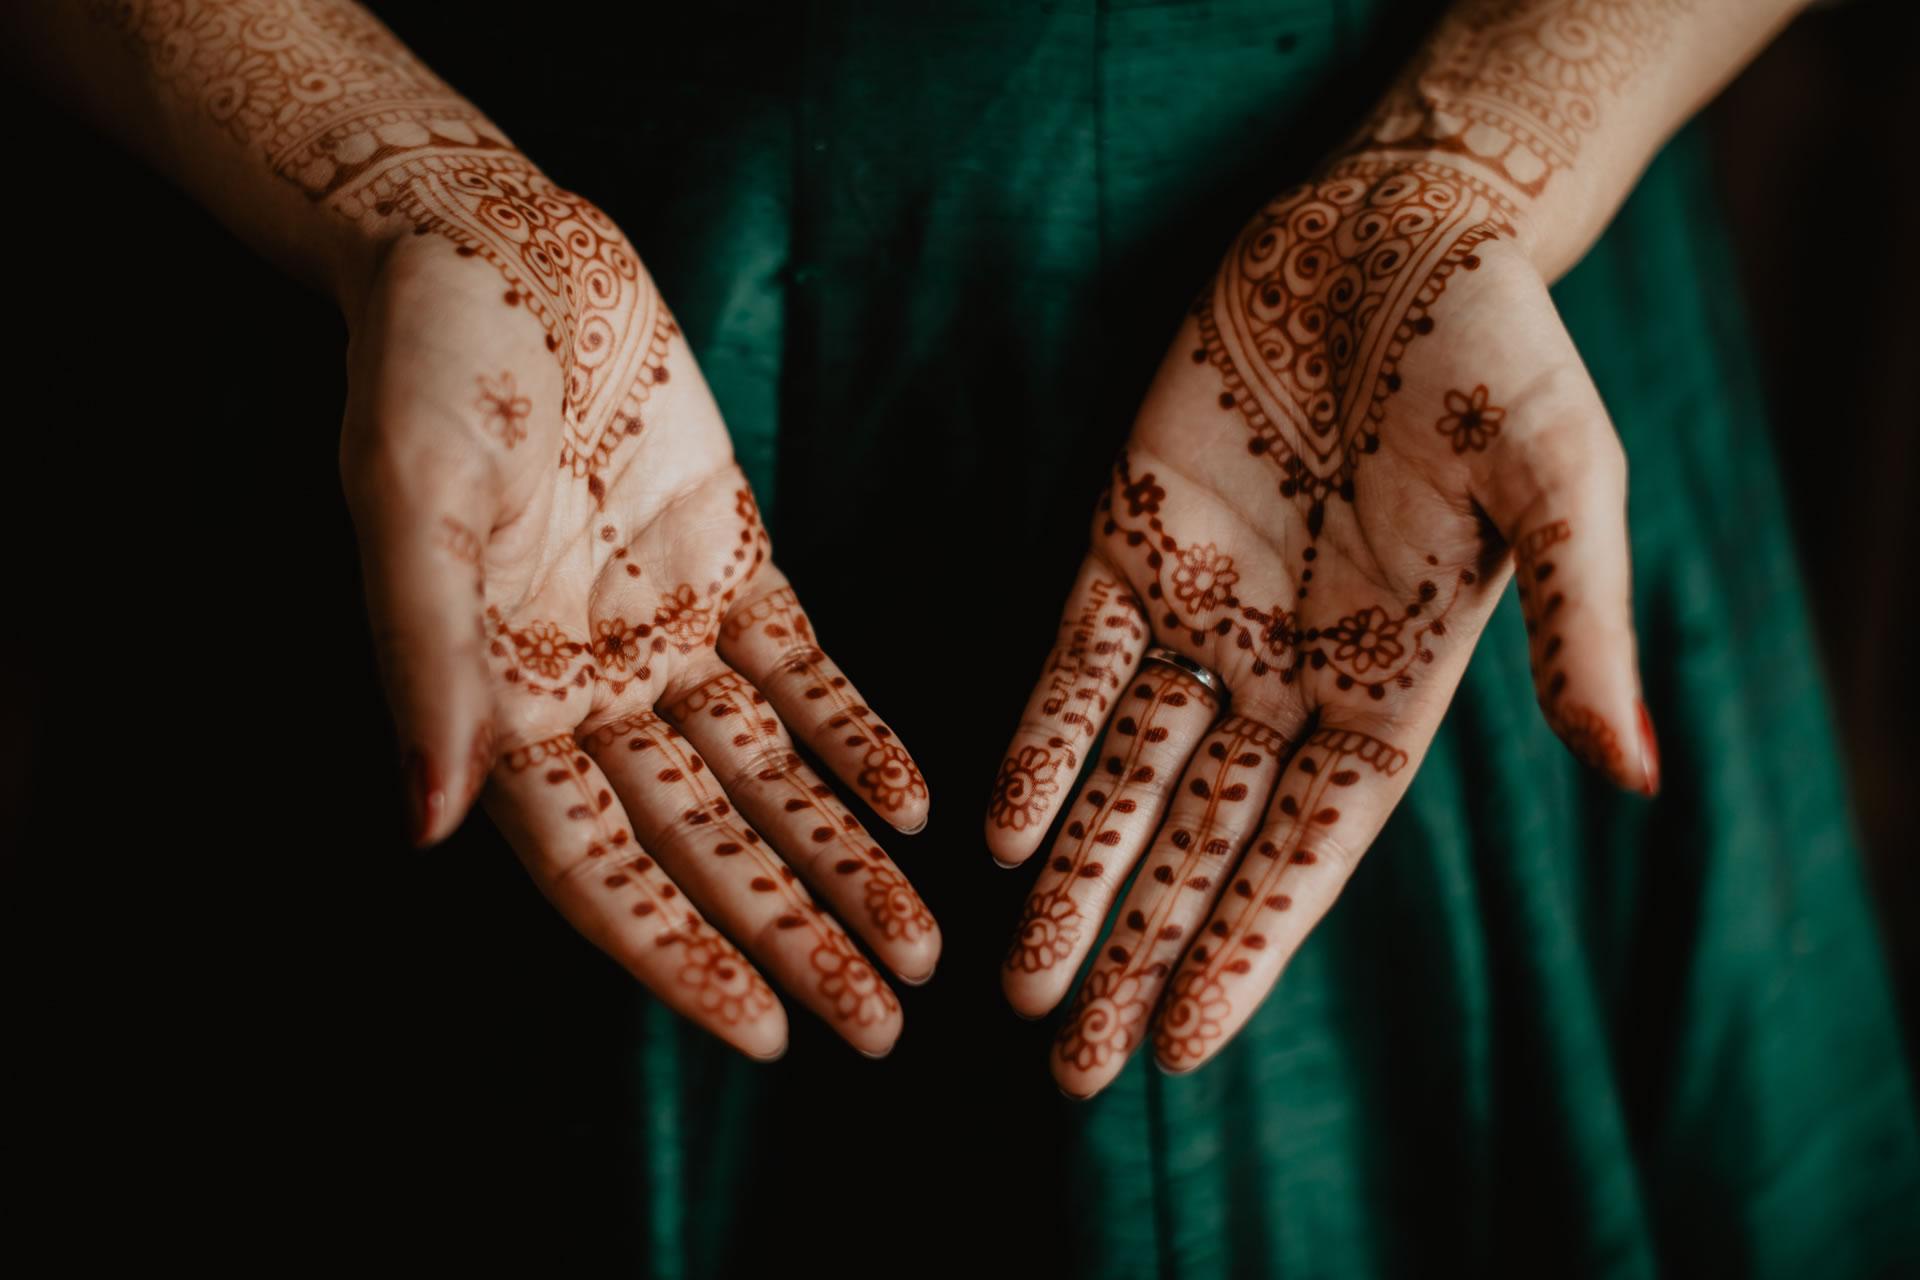 - 34 :: Indian wedding ceremony at Villa Pitiana :: Luxury wedding photography - 33 ::  - 34